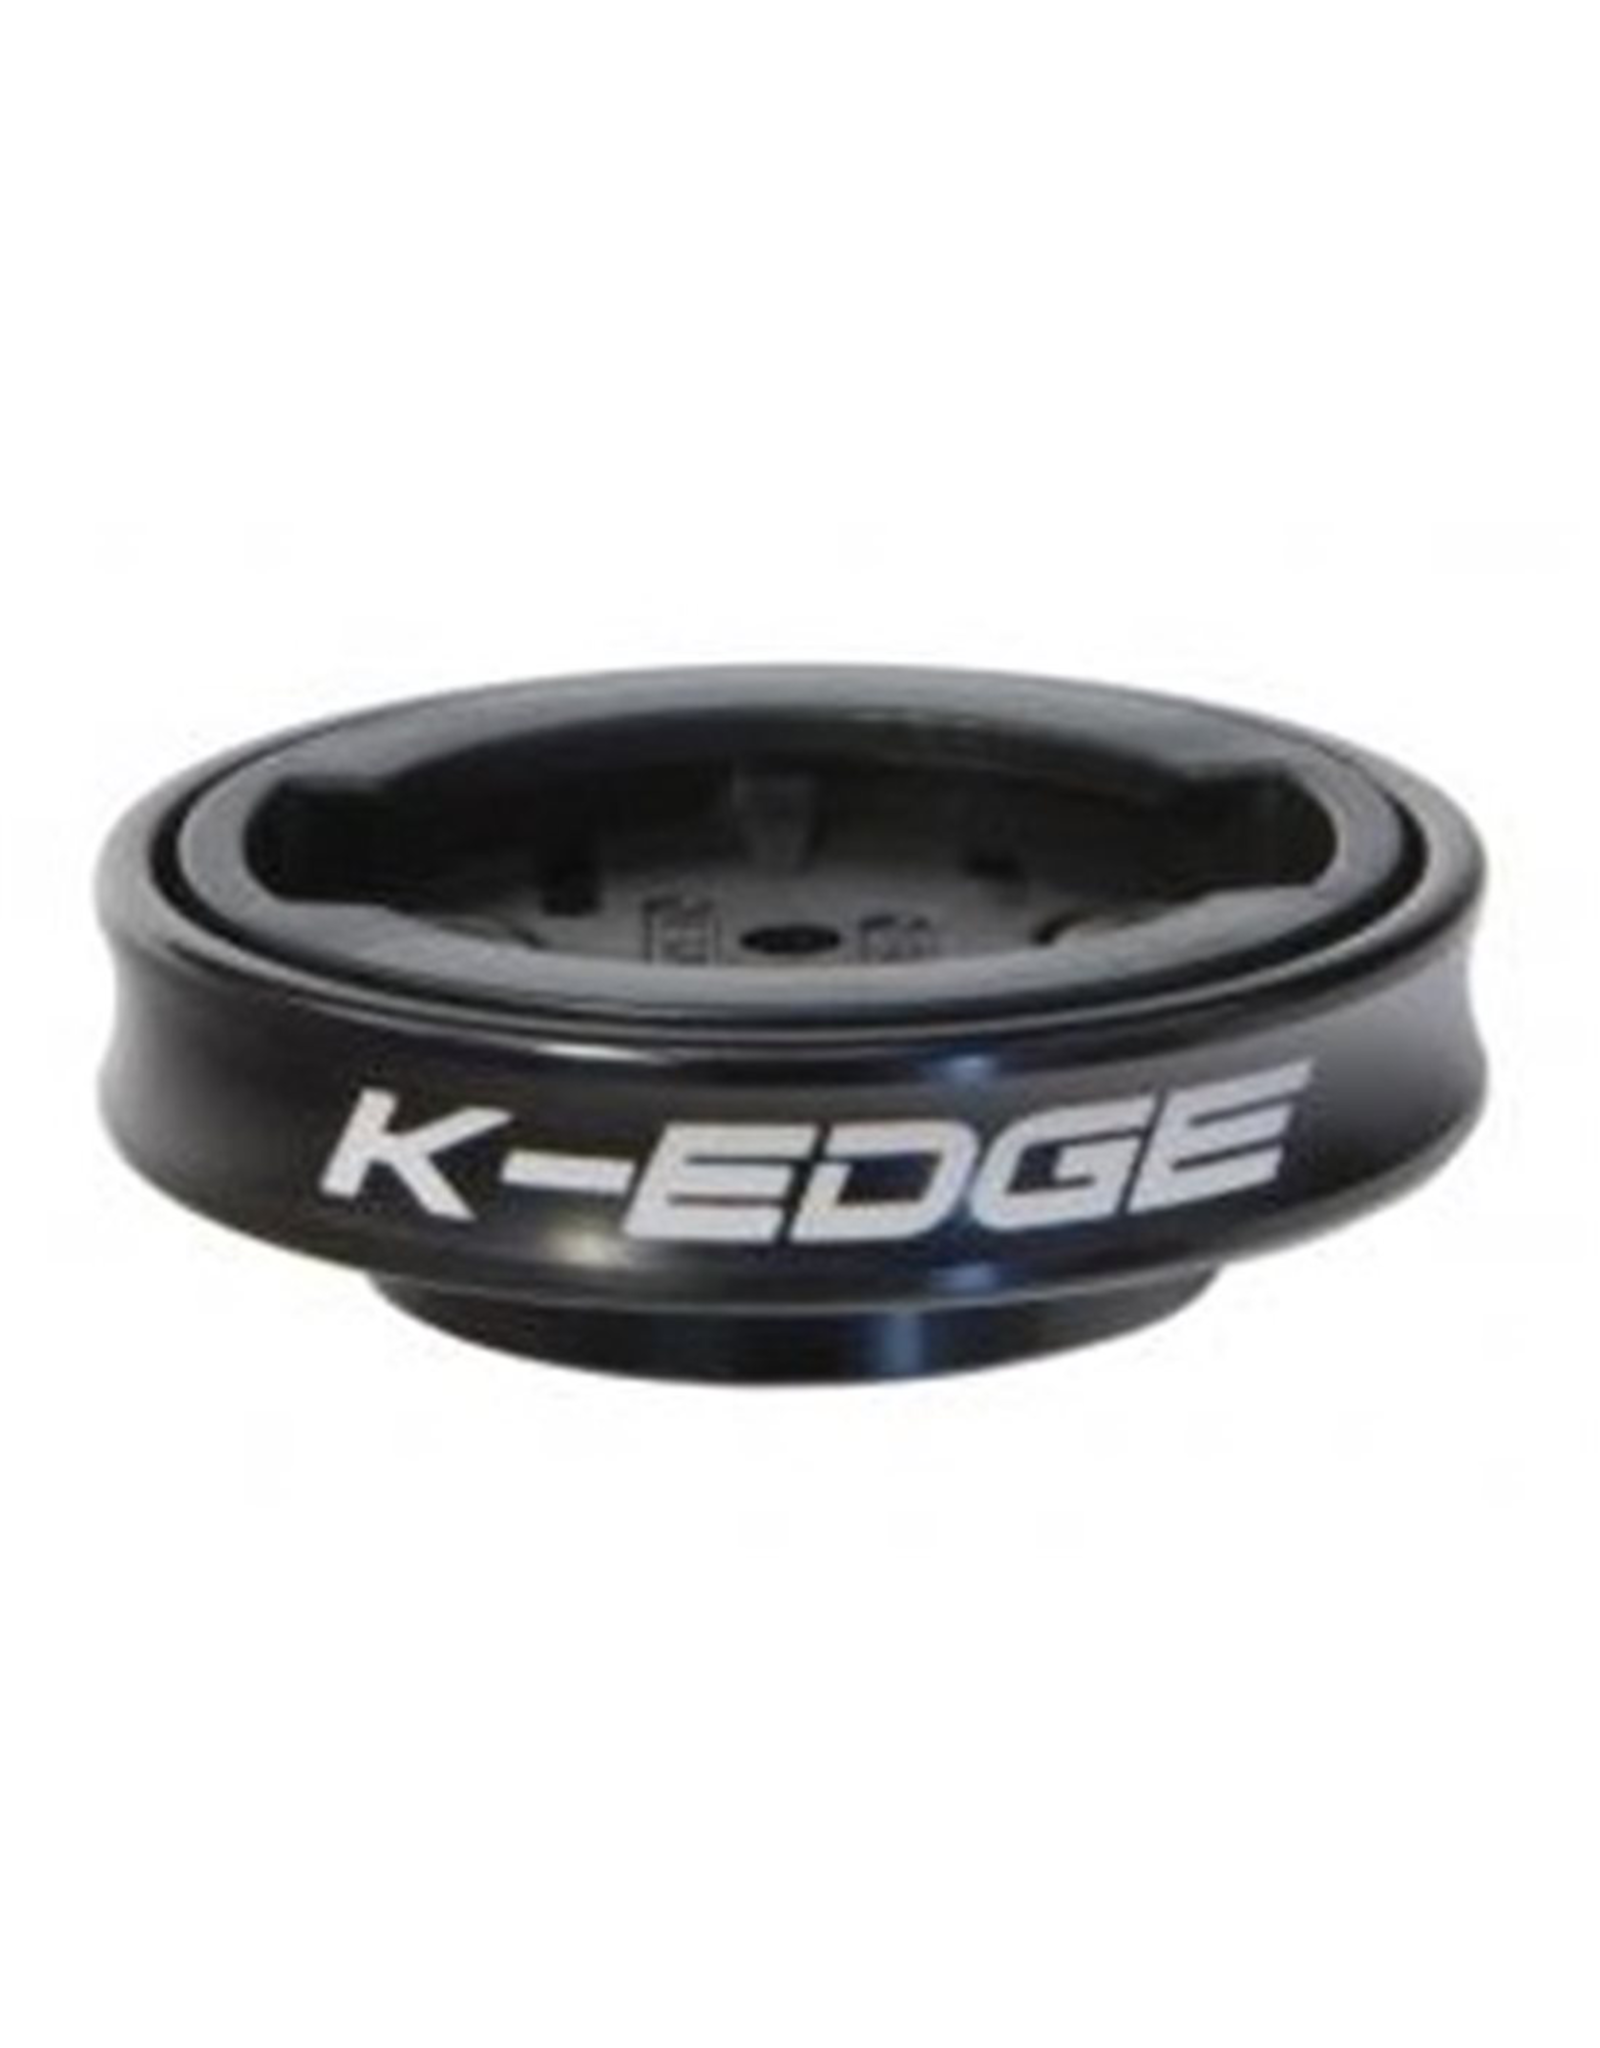 K-EDGE K-EDGE GRAVITY MOUNT FOR GARMIN/BRYTON GPS CYCLE COMPUTER BLACK